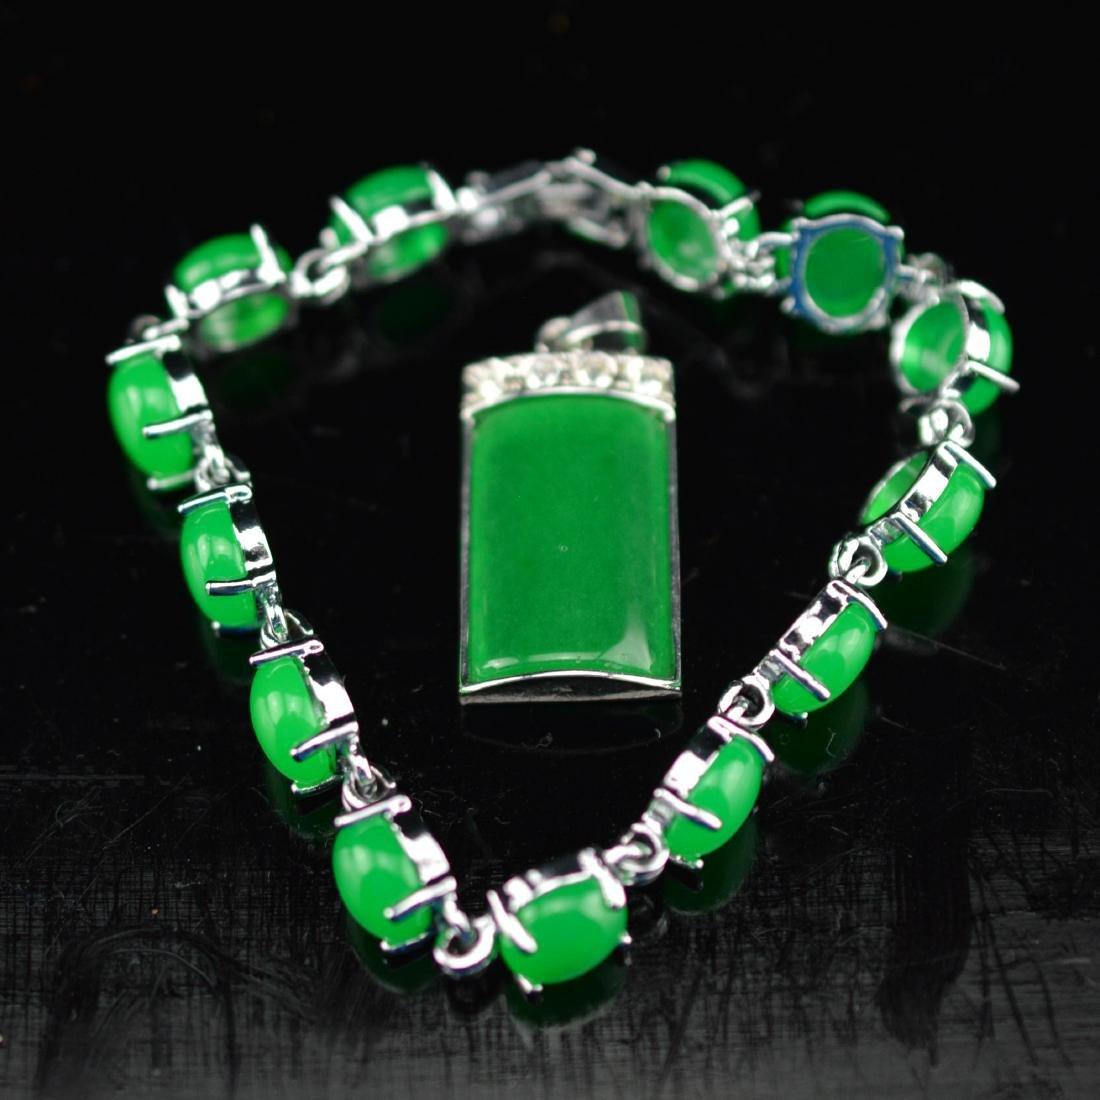 Green agate bracelet and pendant